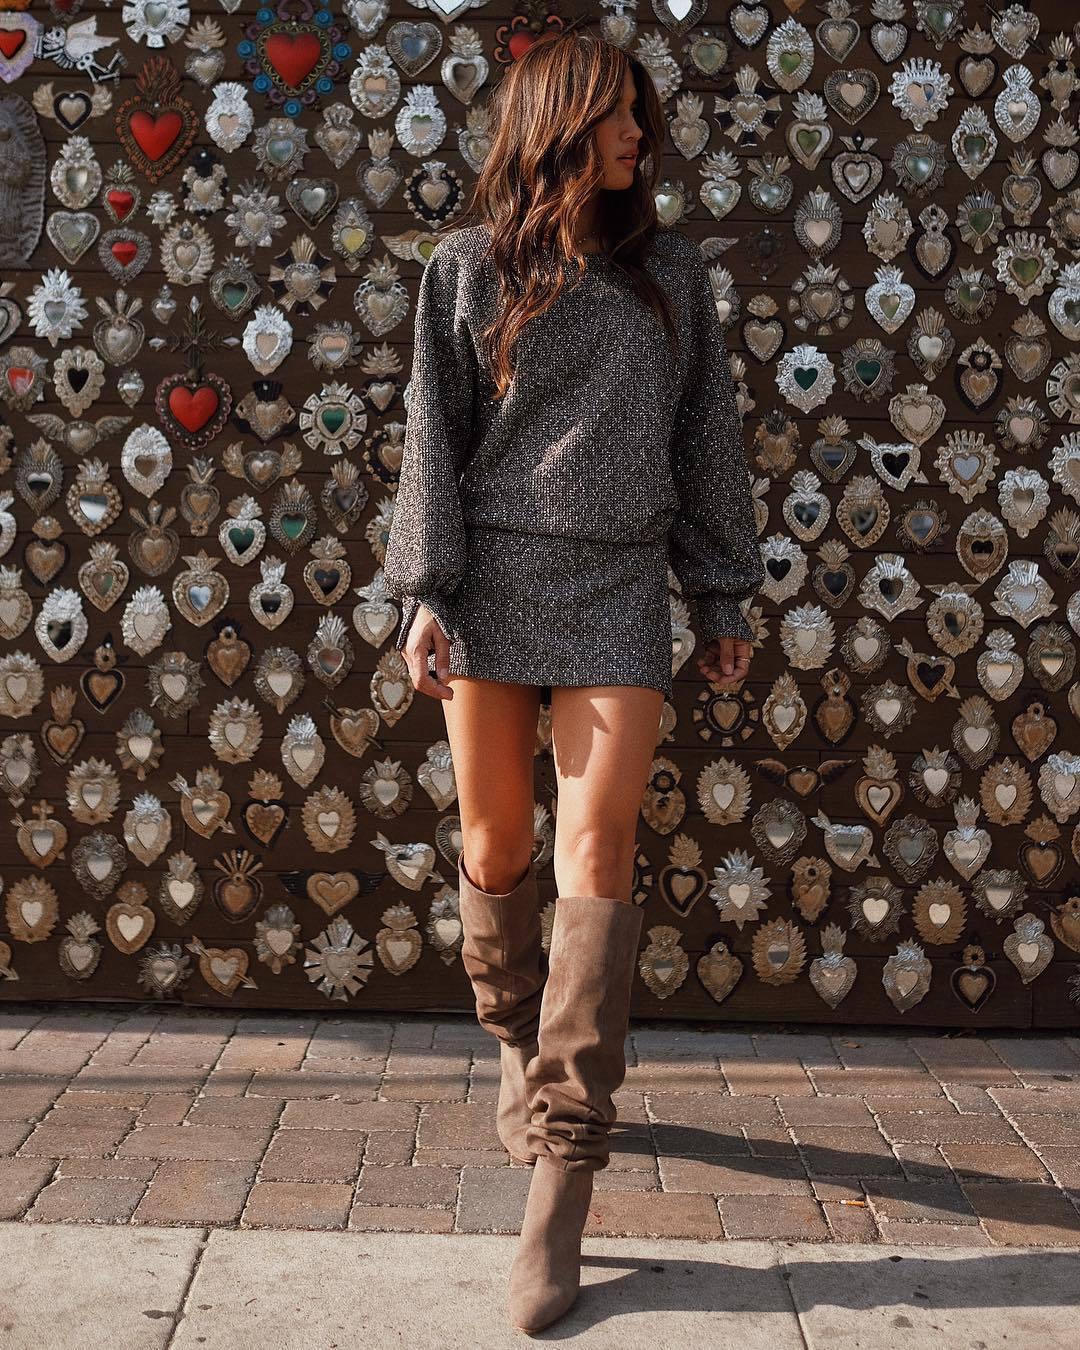 dress rocky barnes instagram glitter boots glitter dress celebrity blogger blogger style shoes knee high boots brown boots heel boots zara long sleeve dress mini dress leather boots